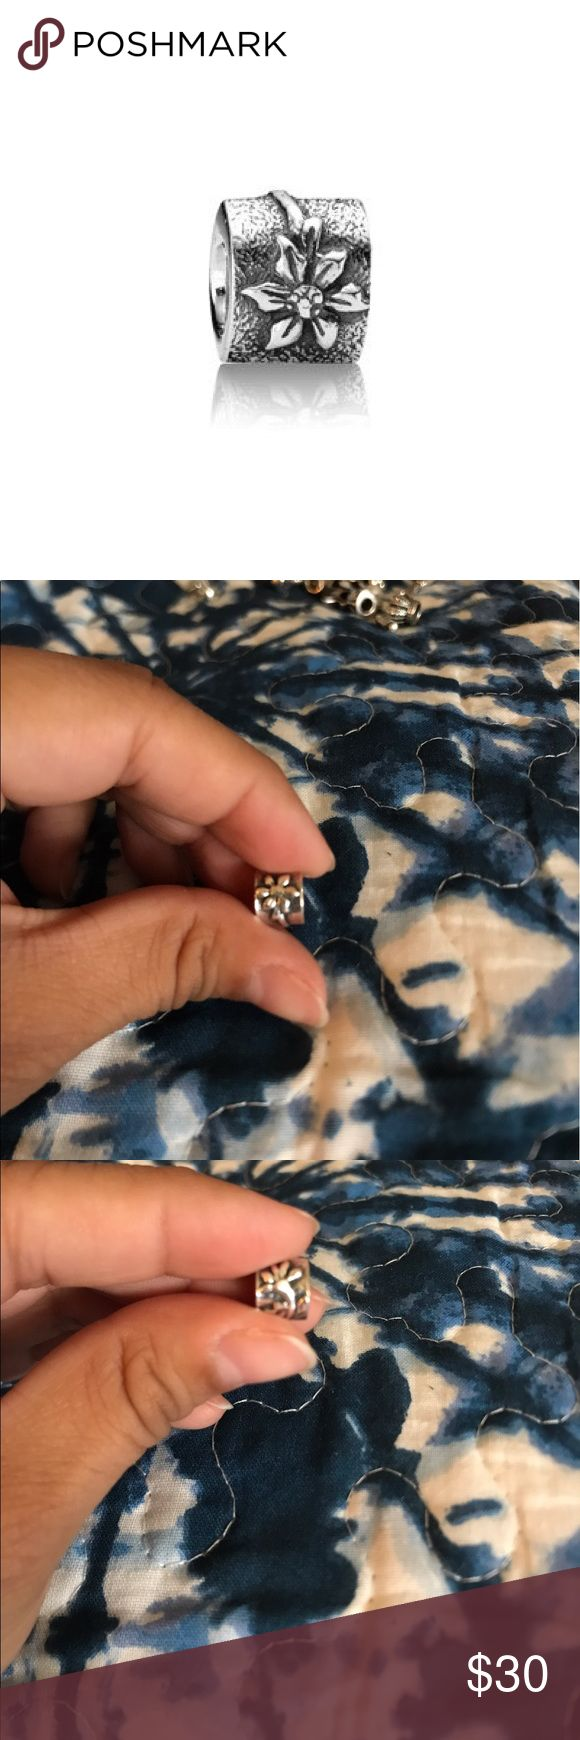 Poinsettia Flower Pandora Charm ALE S925 Great condition Pandora Jewelry